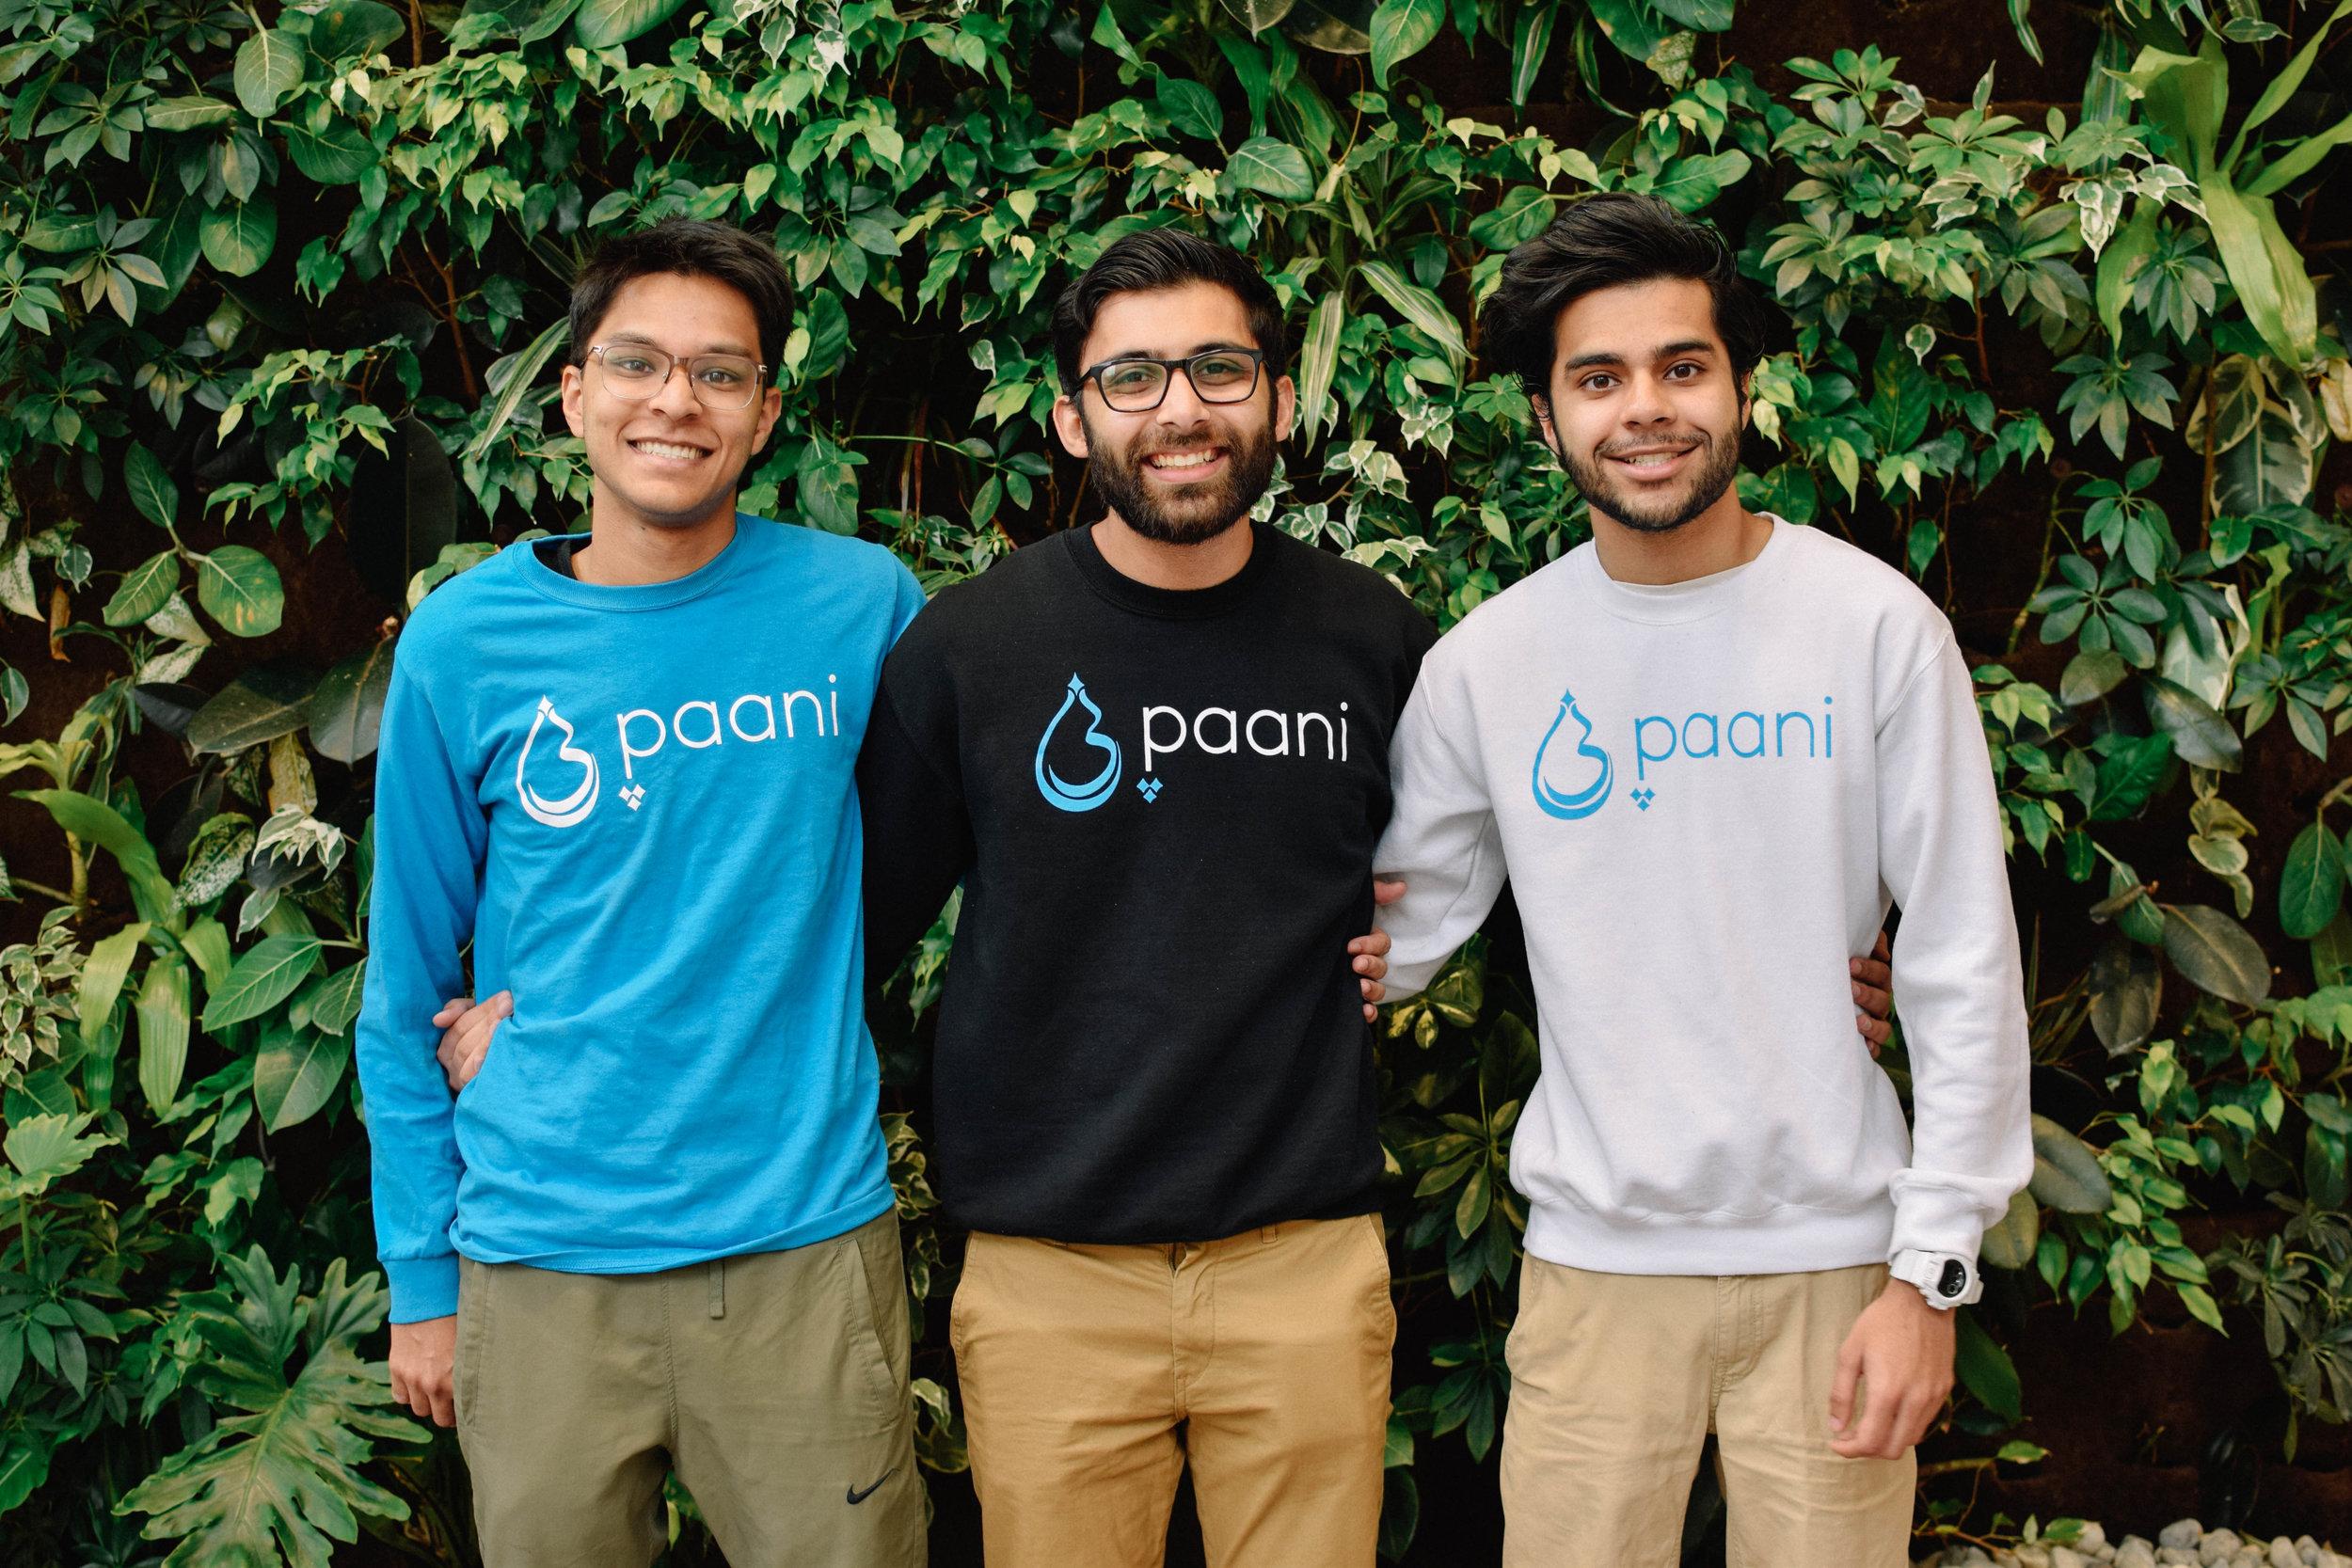 Paani - A nonprofit that aims to improve health and sanitation in PakistanARHUM ARSHAD, SIKANDER 'SONNY' KHAN, NAUMAN KHAN